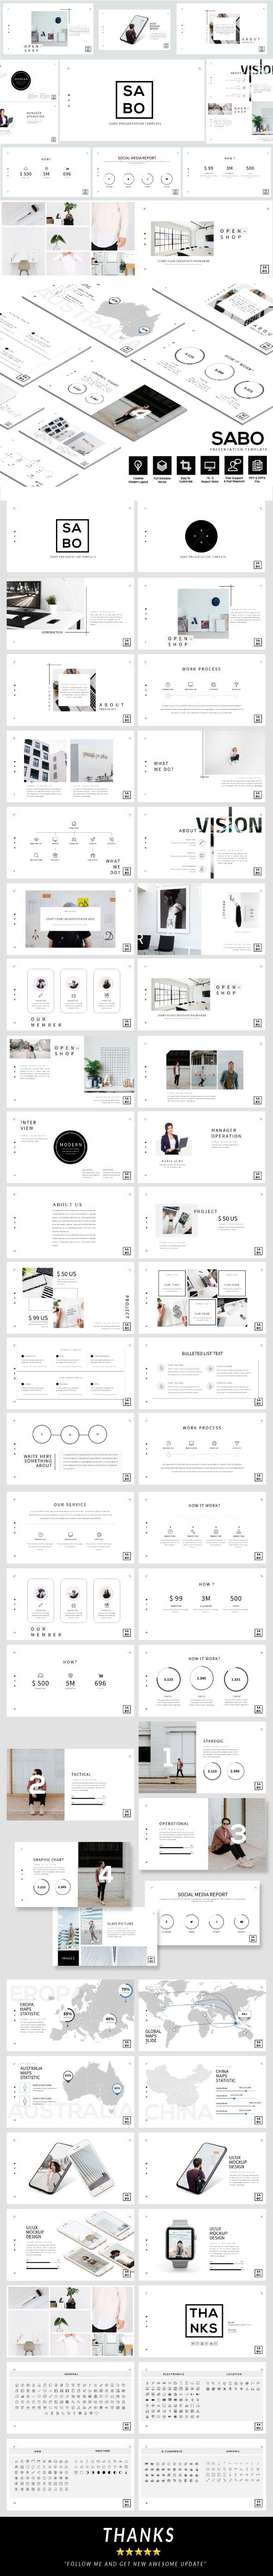 Sabo - Business Presentation Template